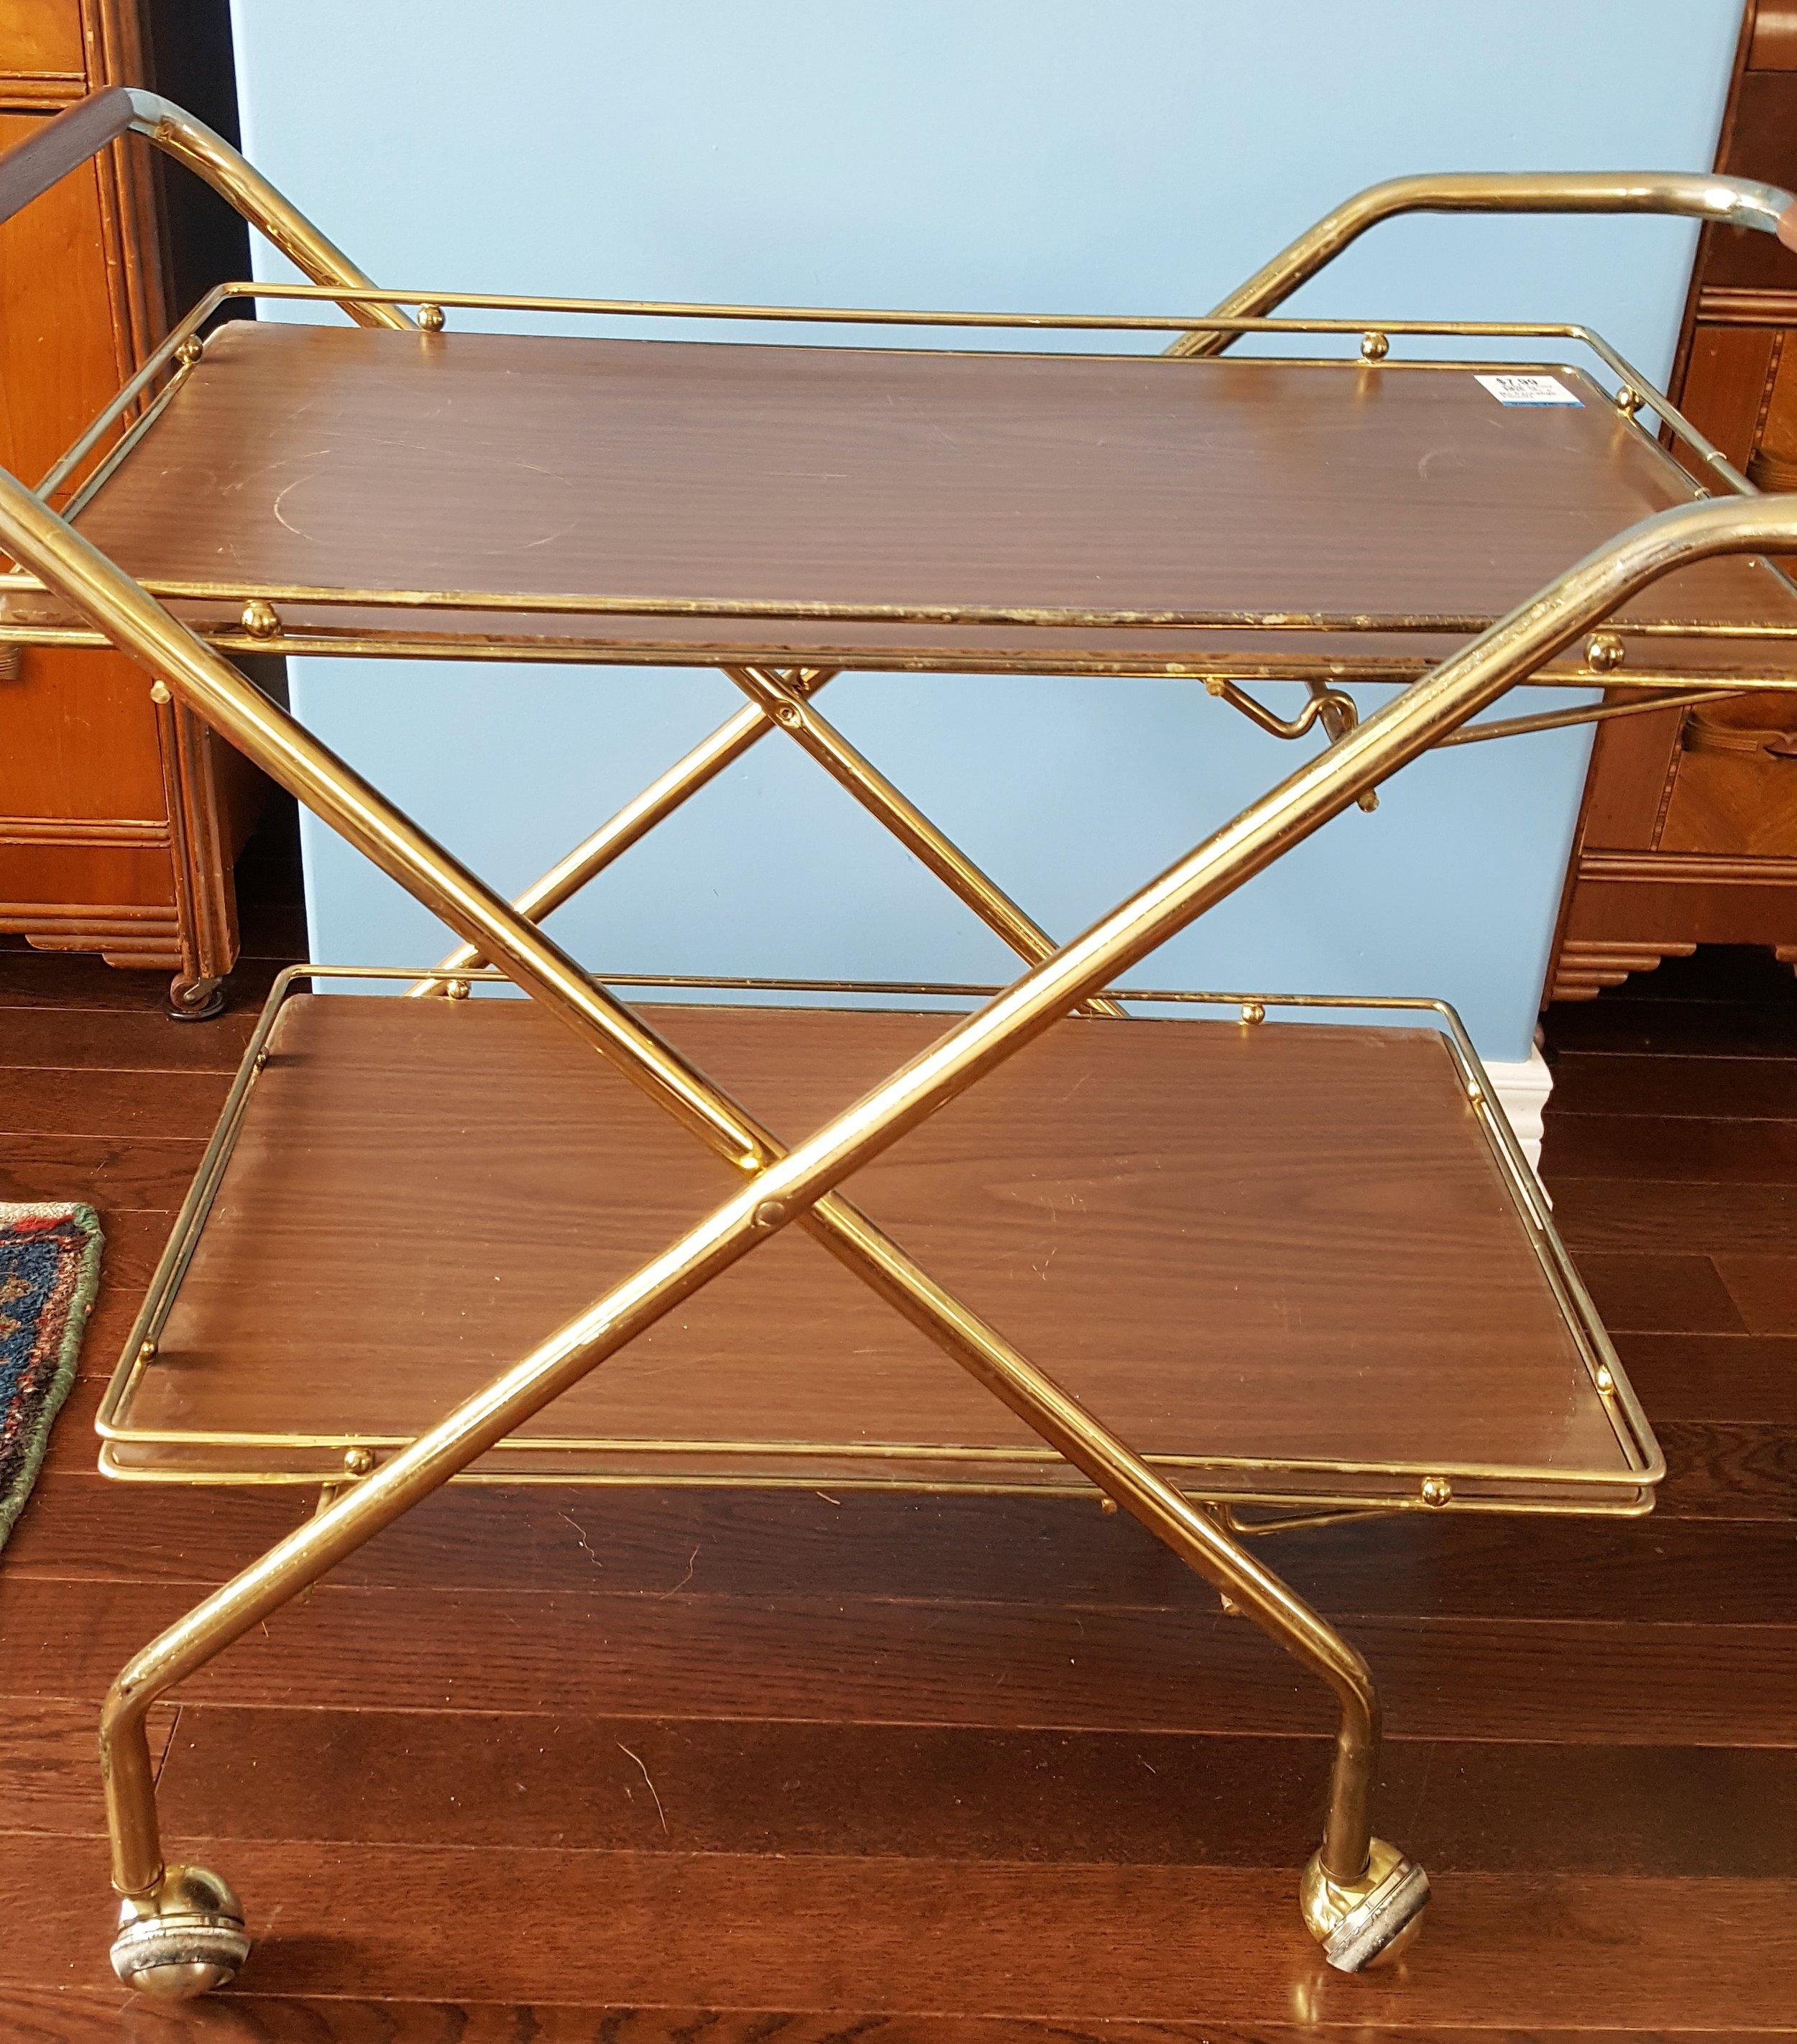 Vintage Bar Cart: Before